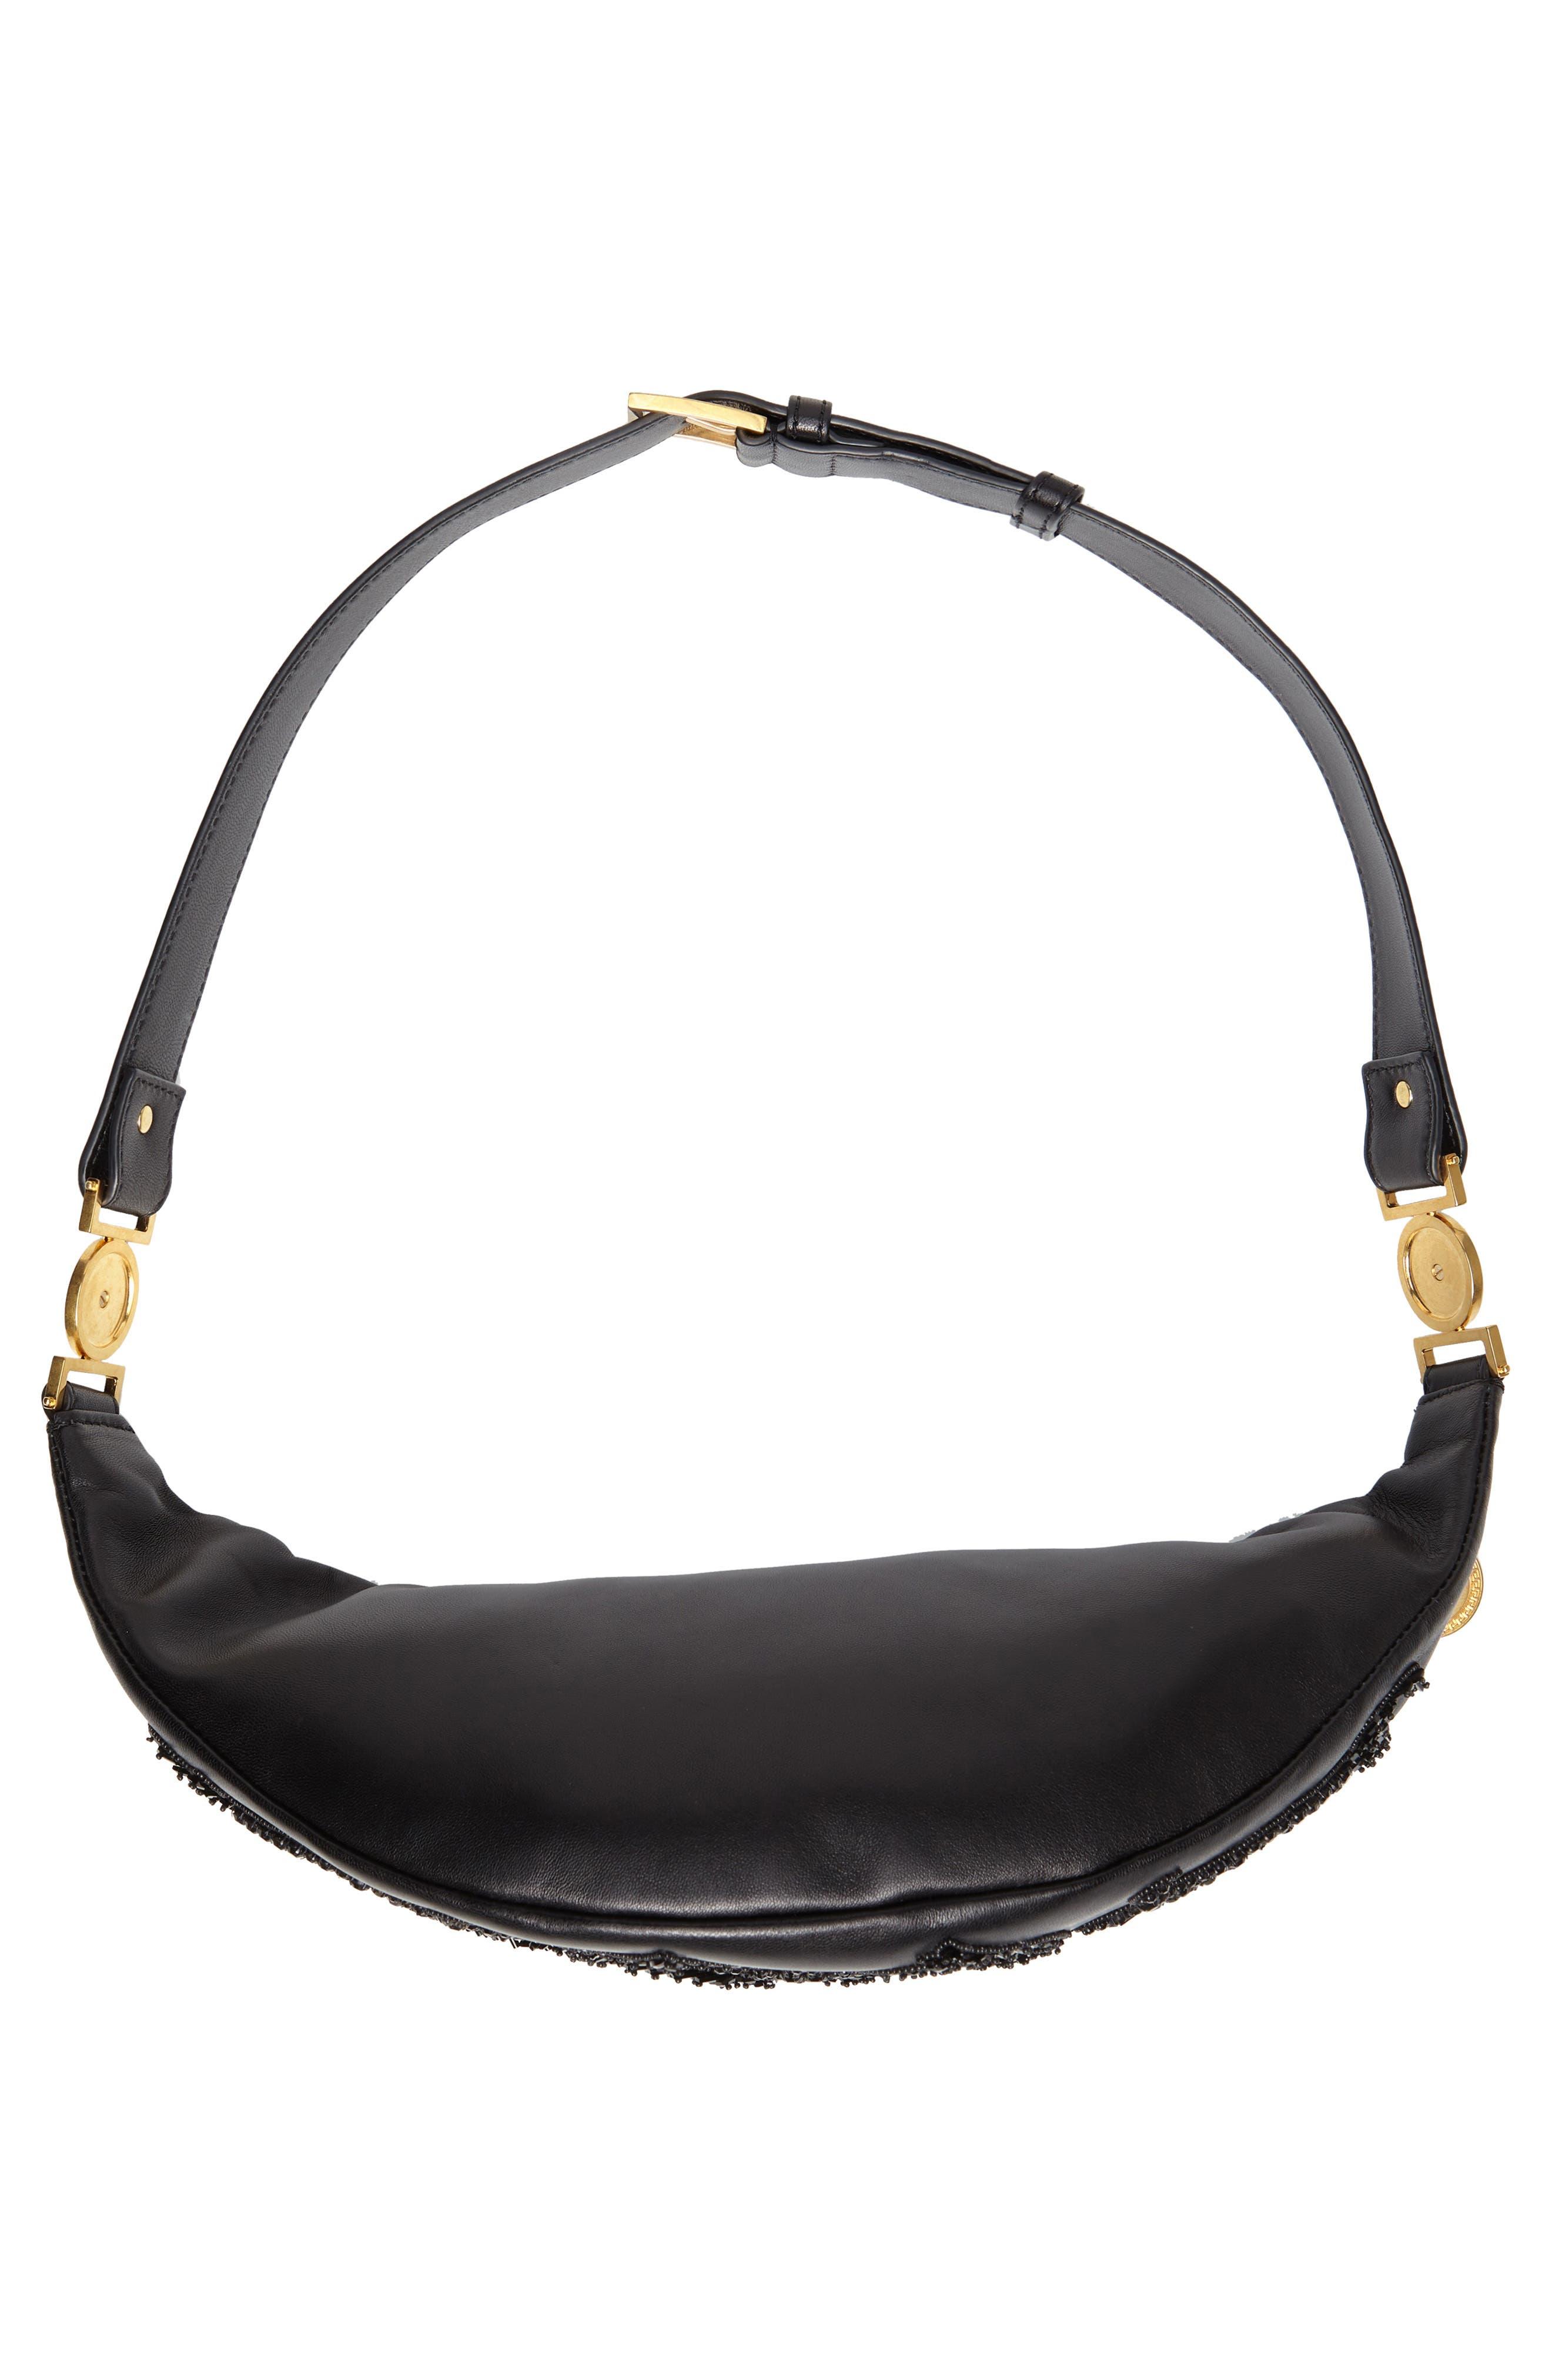 VERSACE COLLECTION,                             Versace Crystal Embellished Leather Belt Bag,                             Alternate thumbnail 7, color,                             NERO